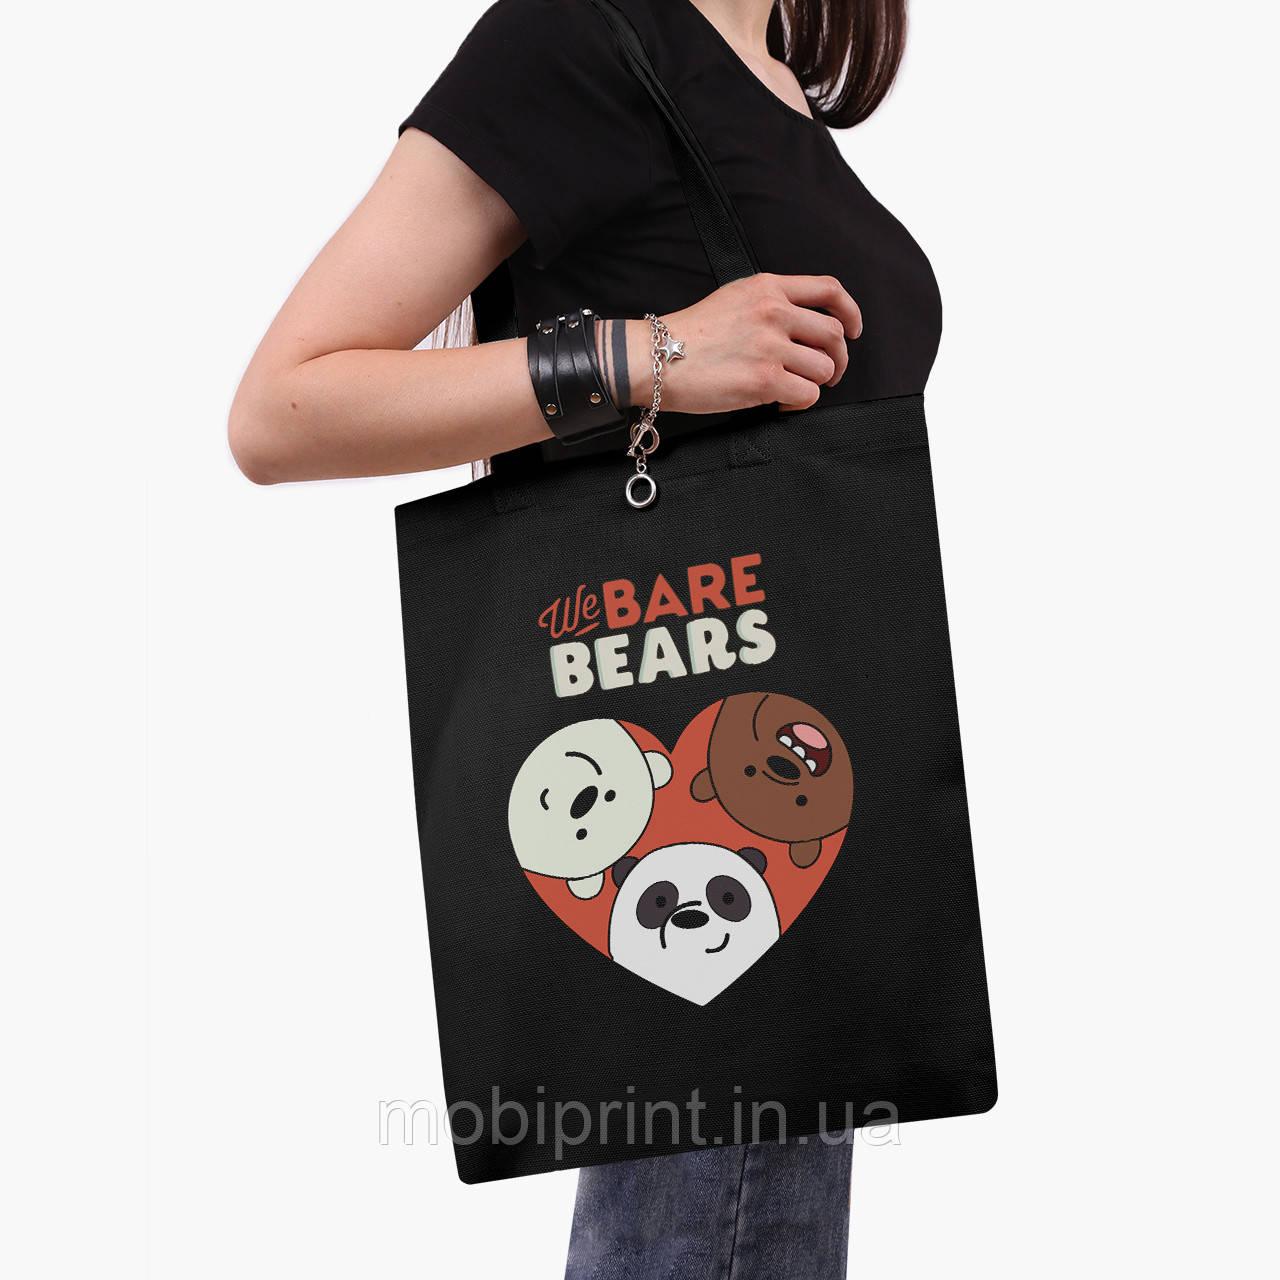 Еко сумка шоппер чорна Вся правда про ведмедів (We Bare Bears) (9227-2669-2) 41*35 см